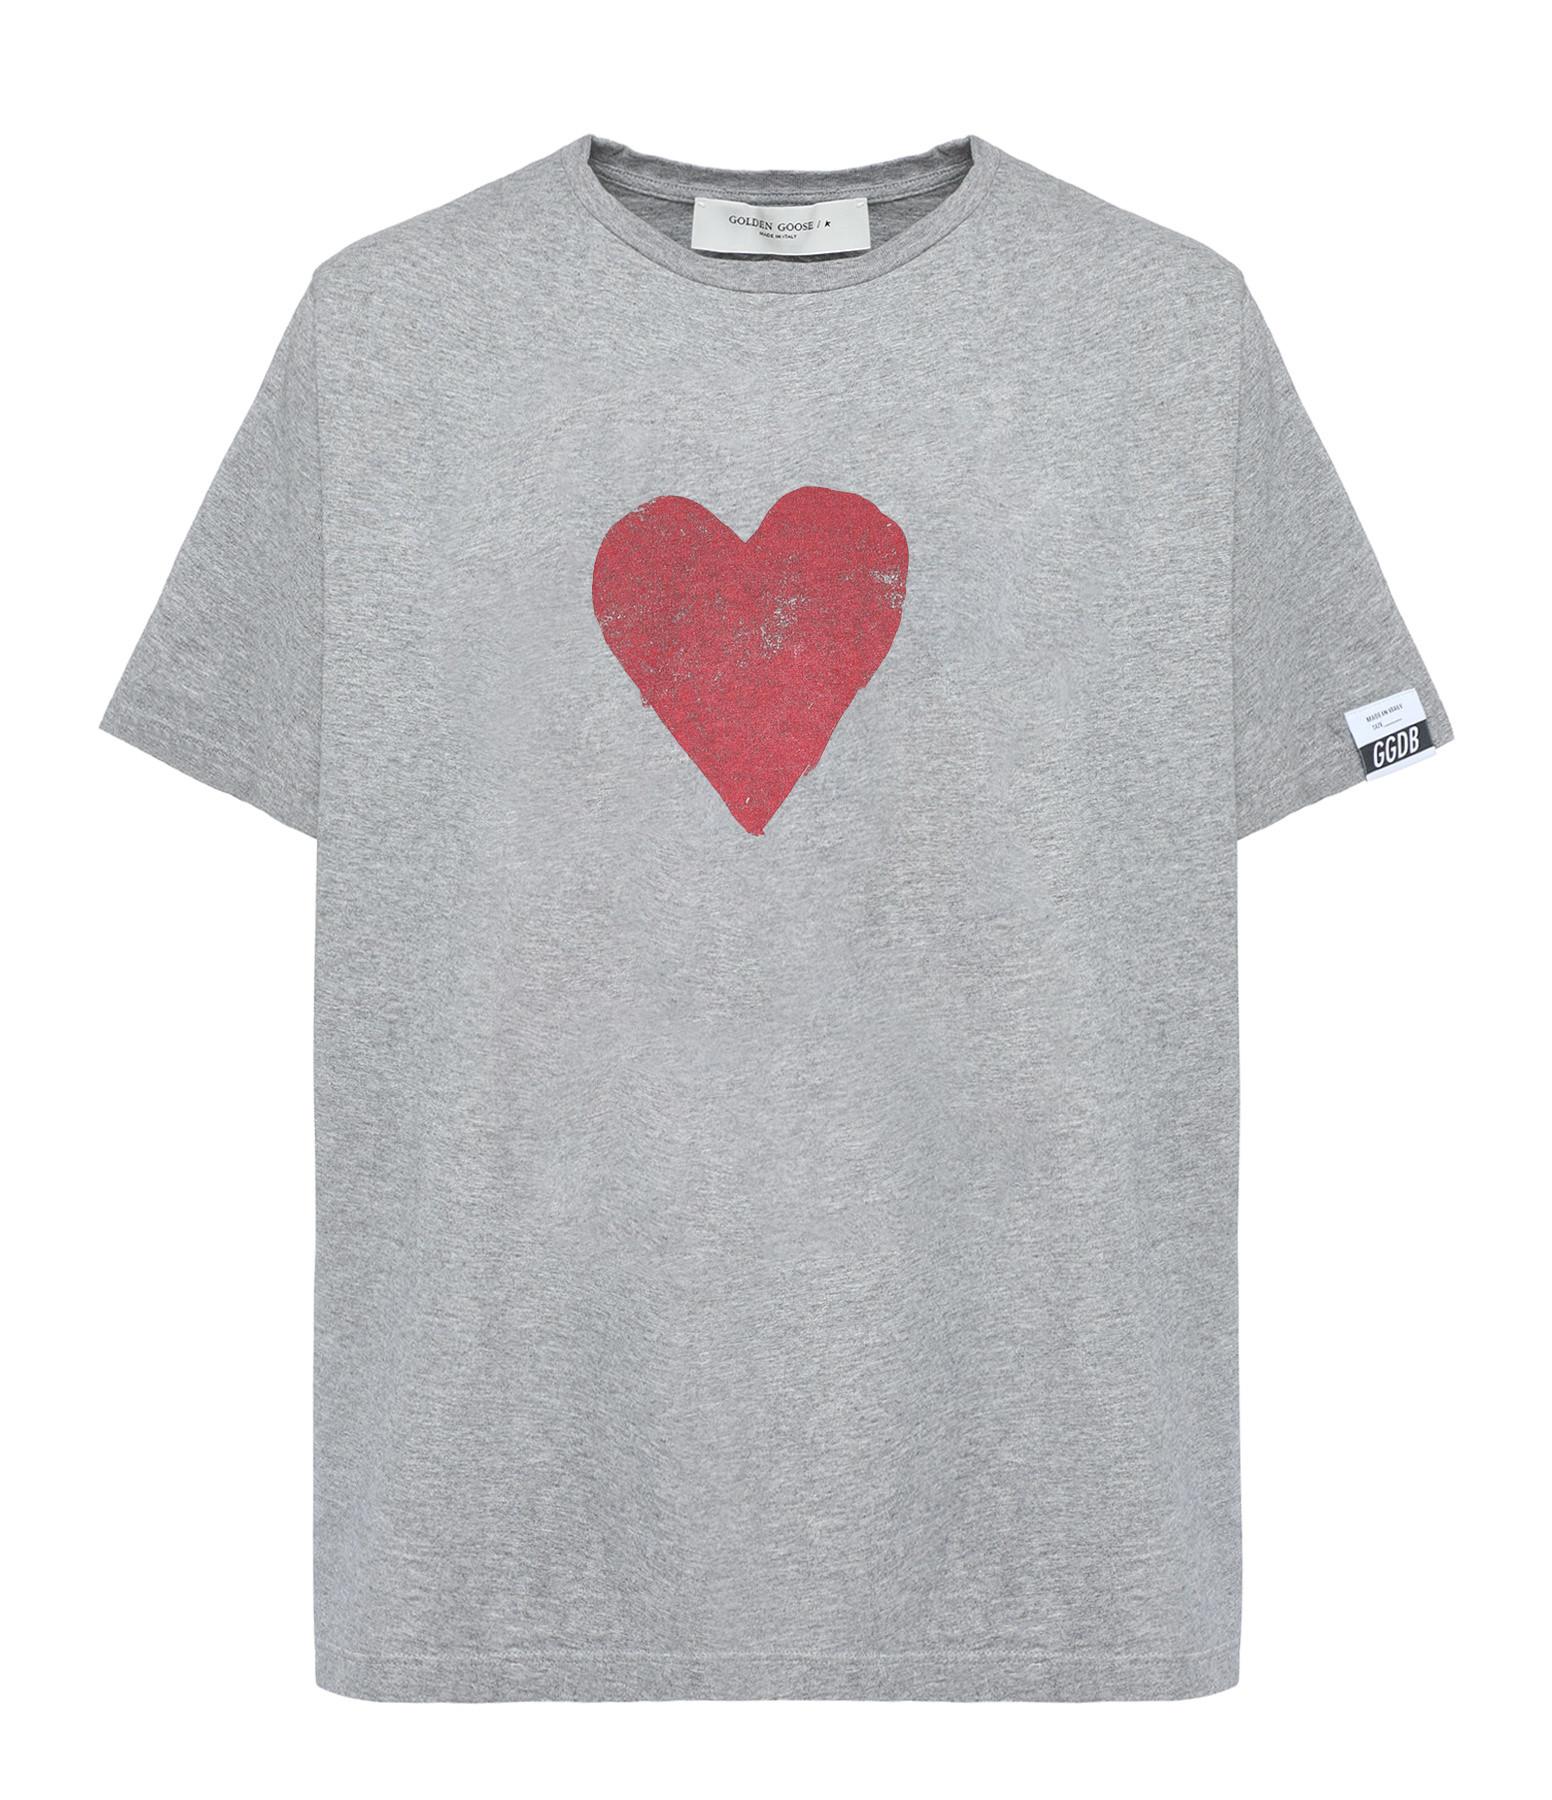 GOLDEN GOOSE - Tee-shirt Homme Artu Coeur Coton Rouge Gris